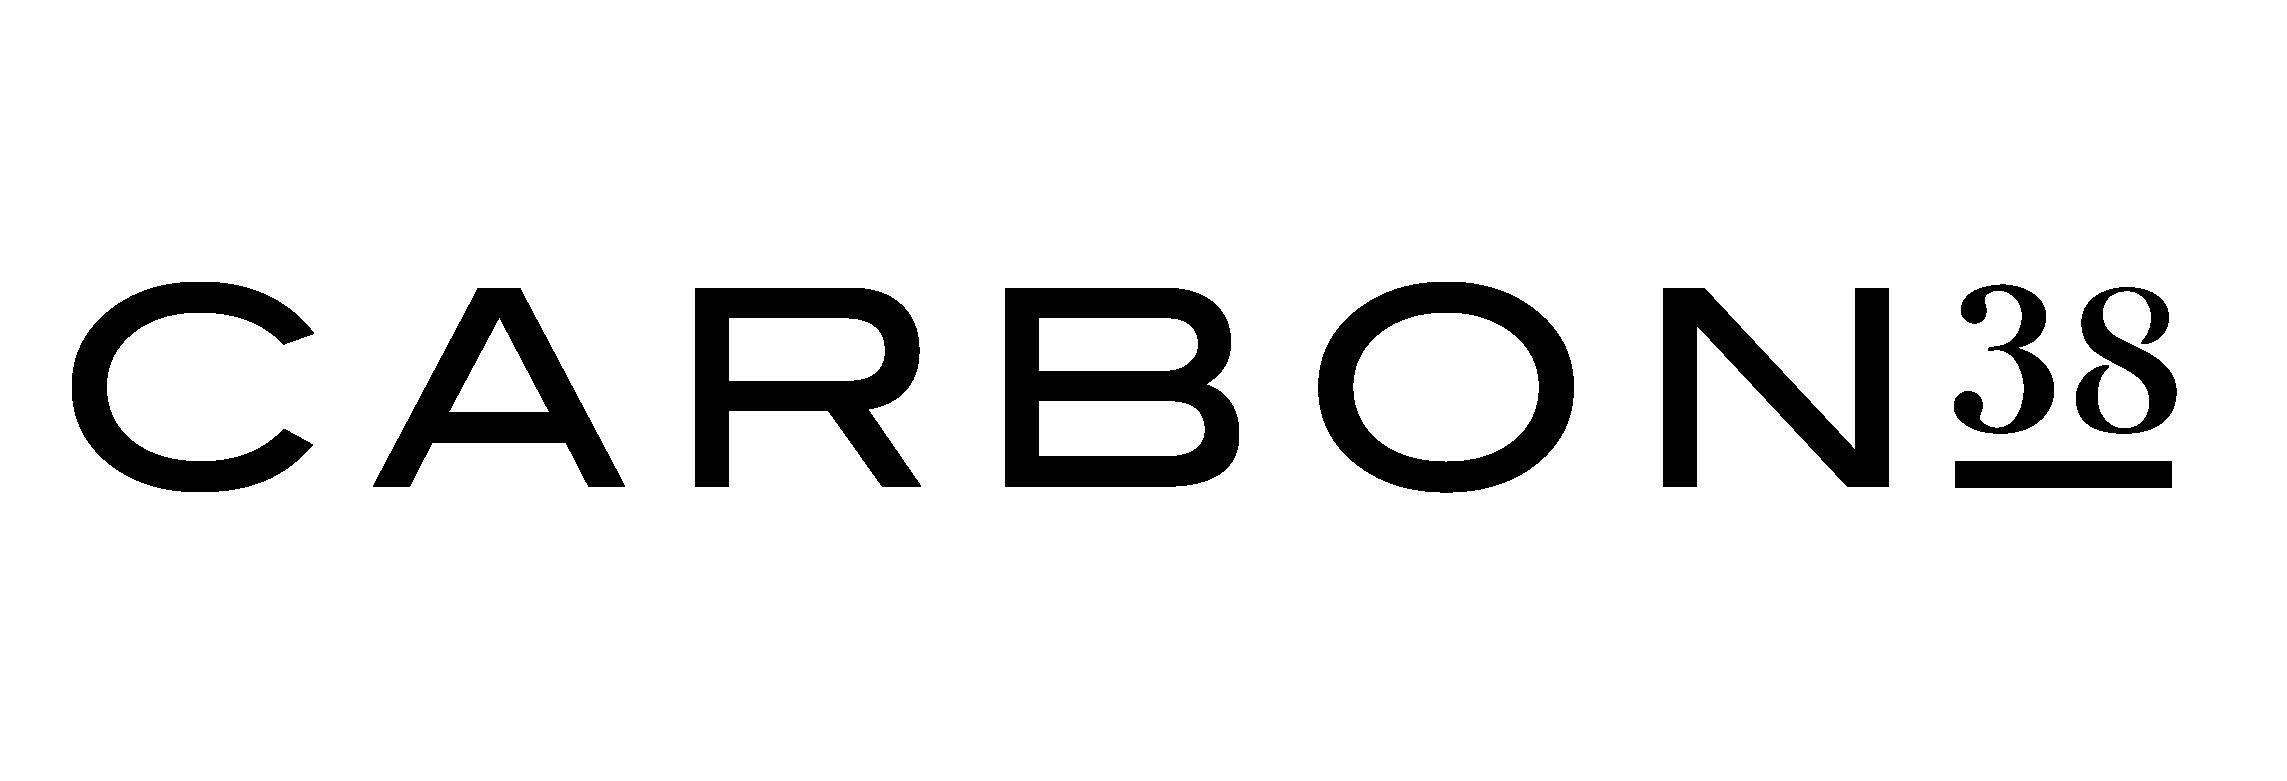 Carbon38-logo.png